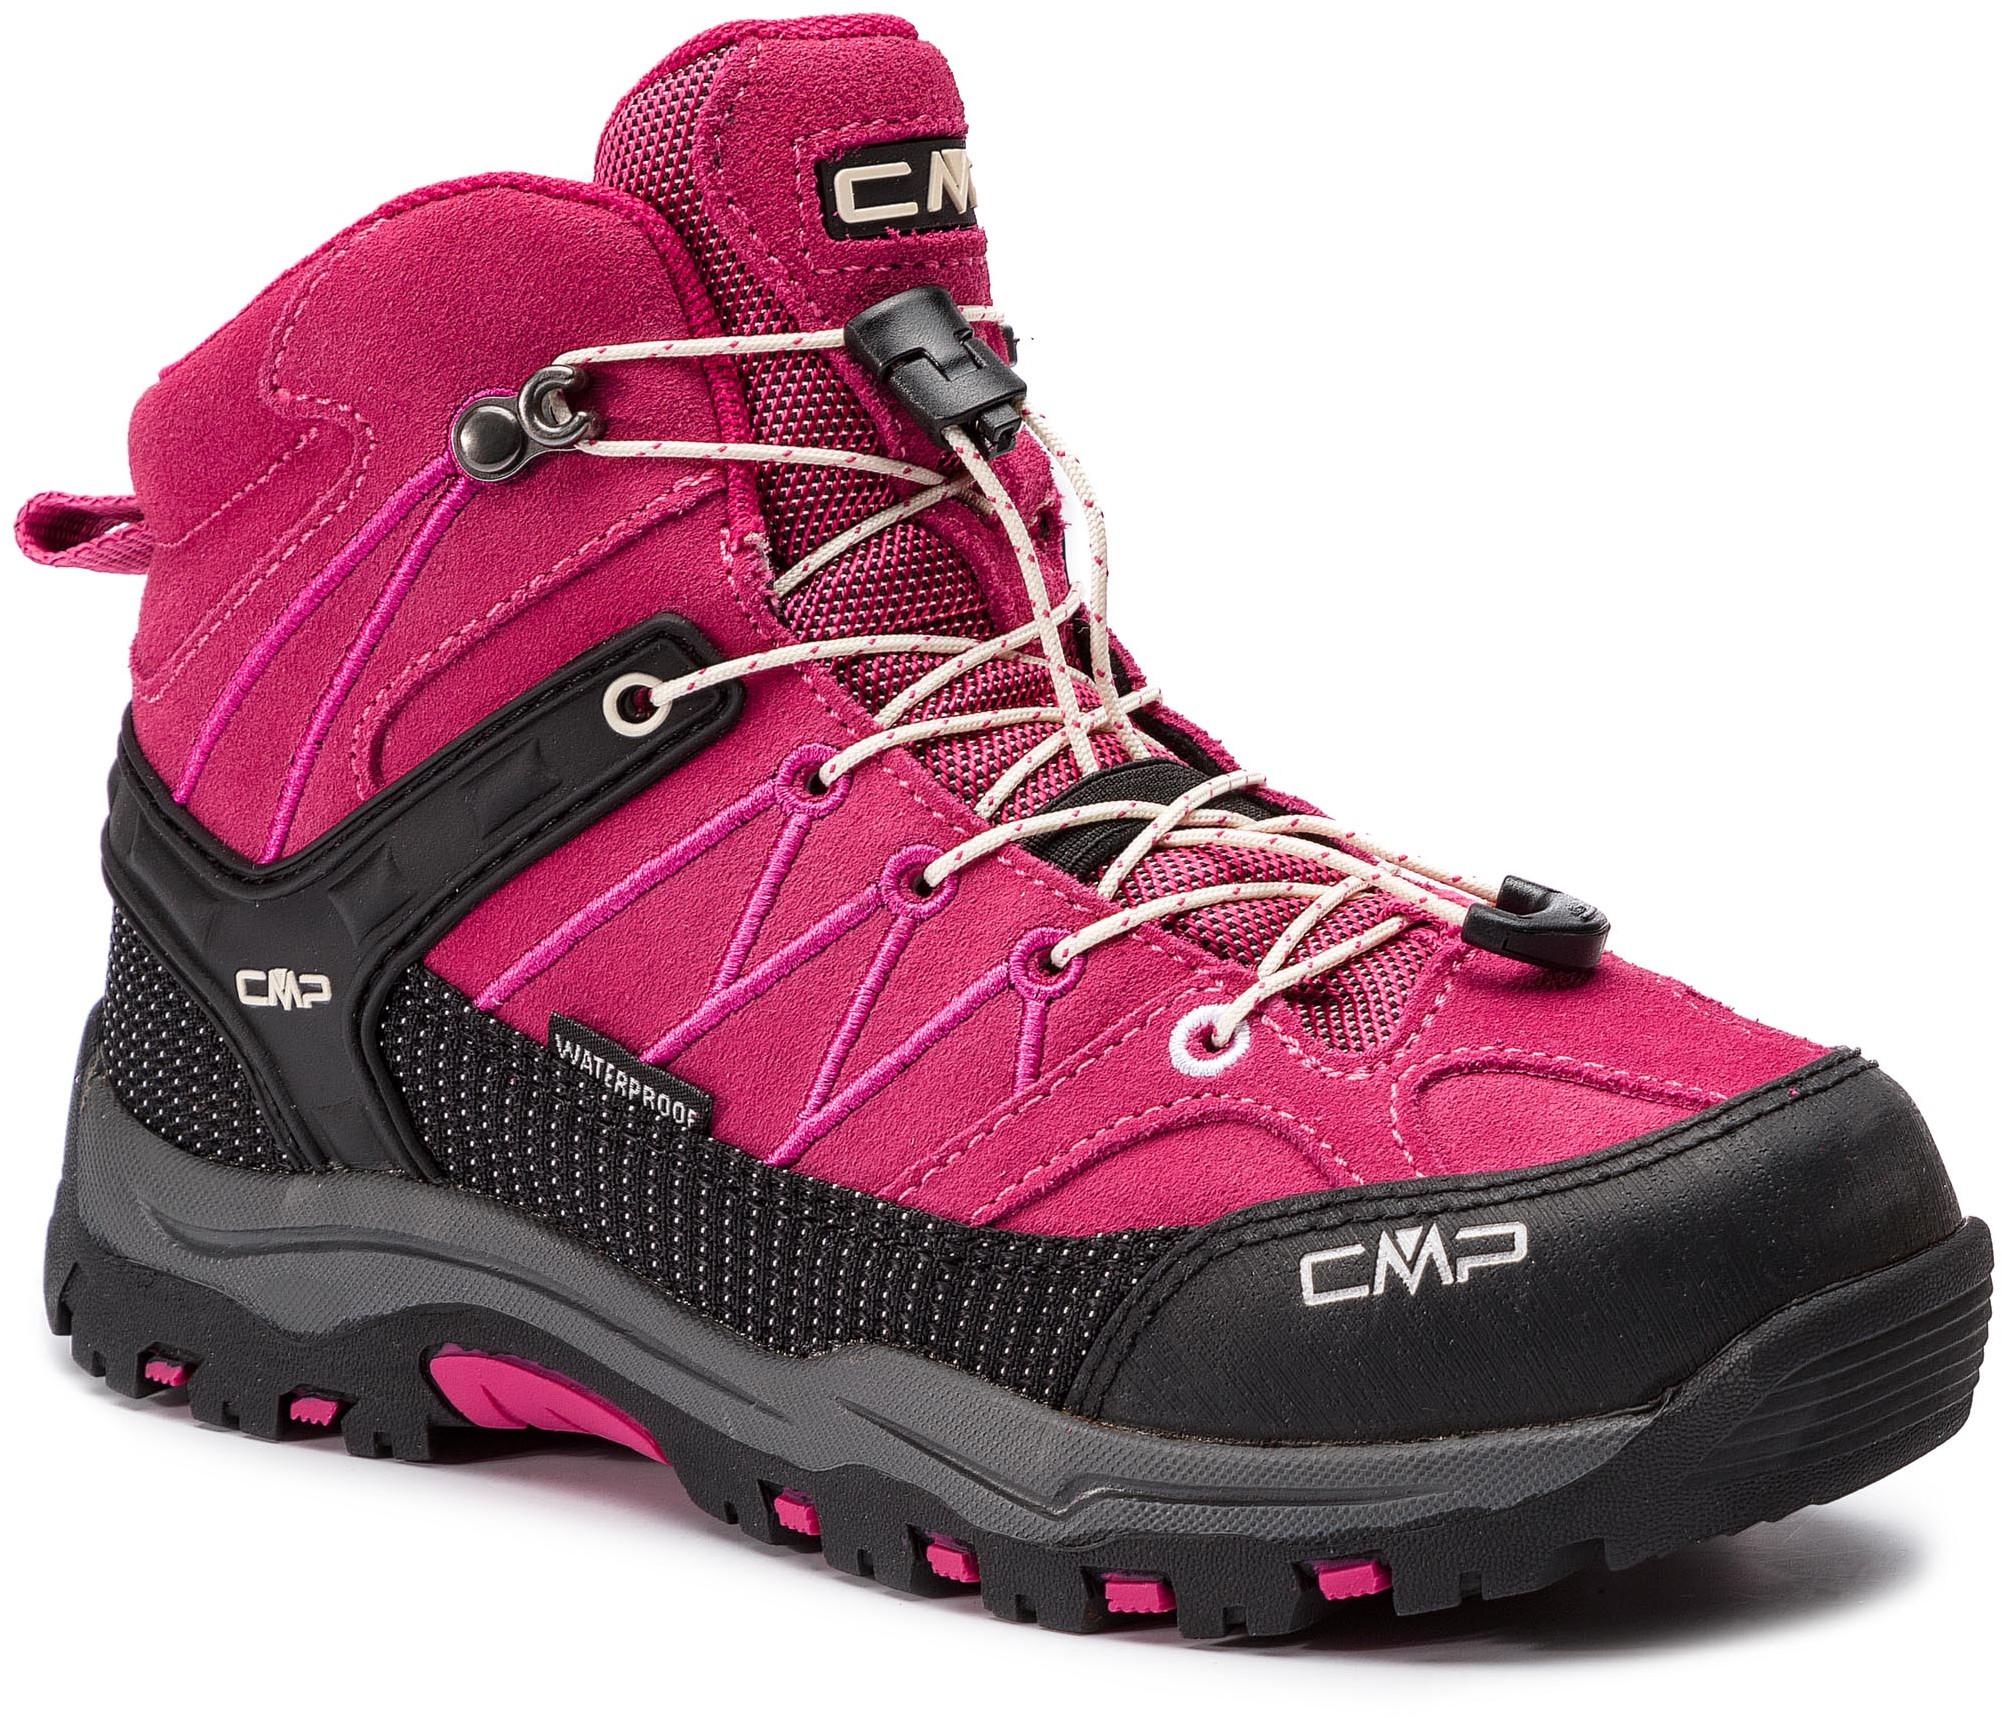 a4c3f504 CMP Trekkingi Kids Rigel Mid Trekking Shoes Wp 3Q12944J Geraneo/Off White